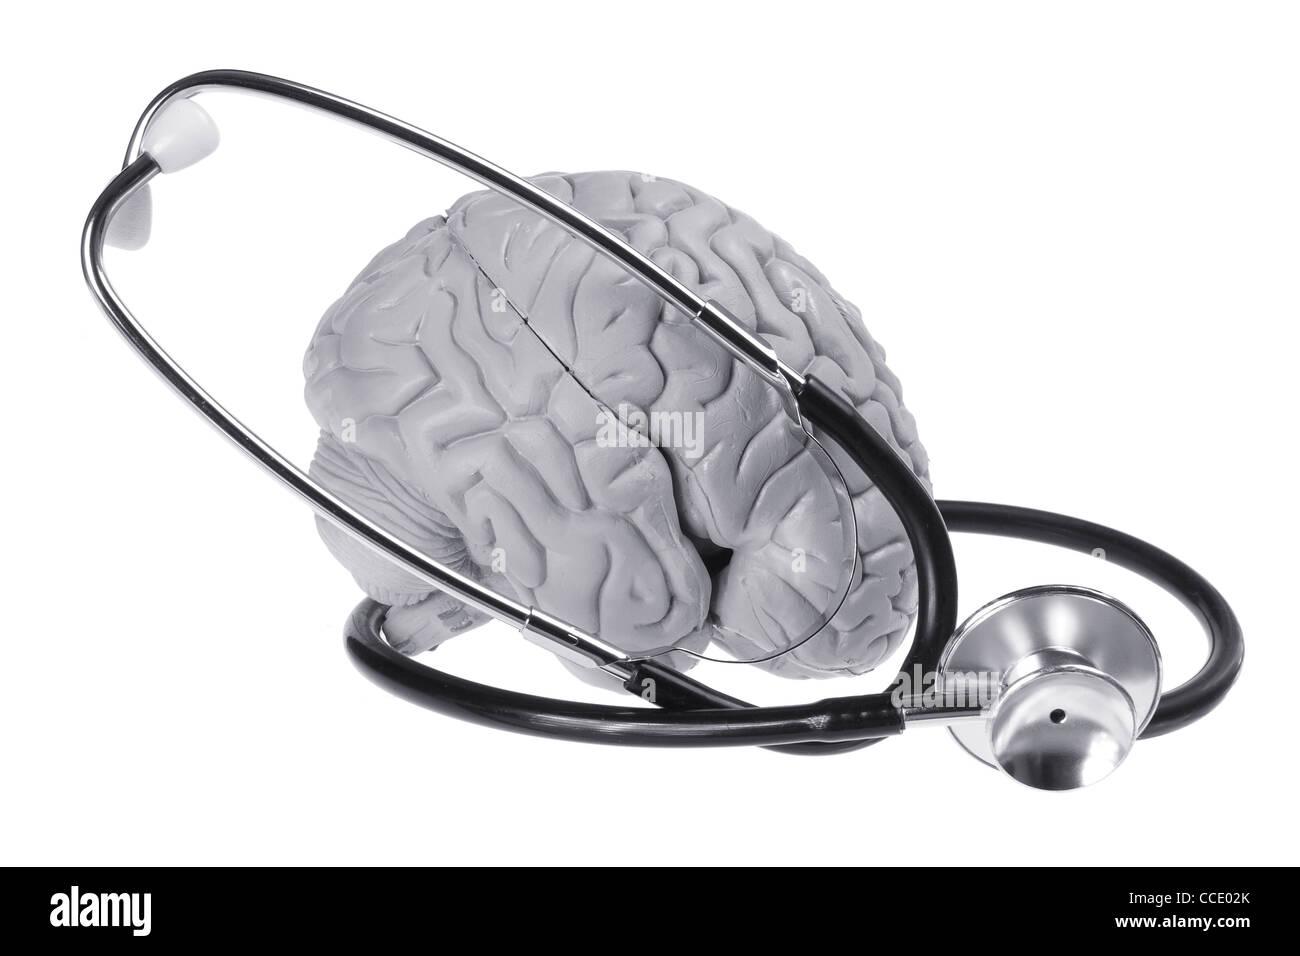 Brain Specimen and Stethoscope - Stock Image